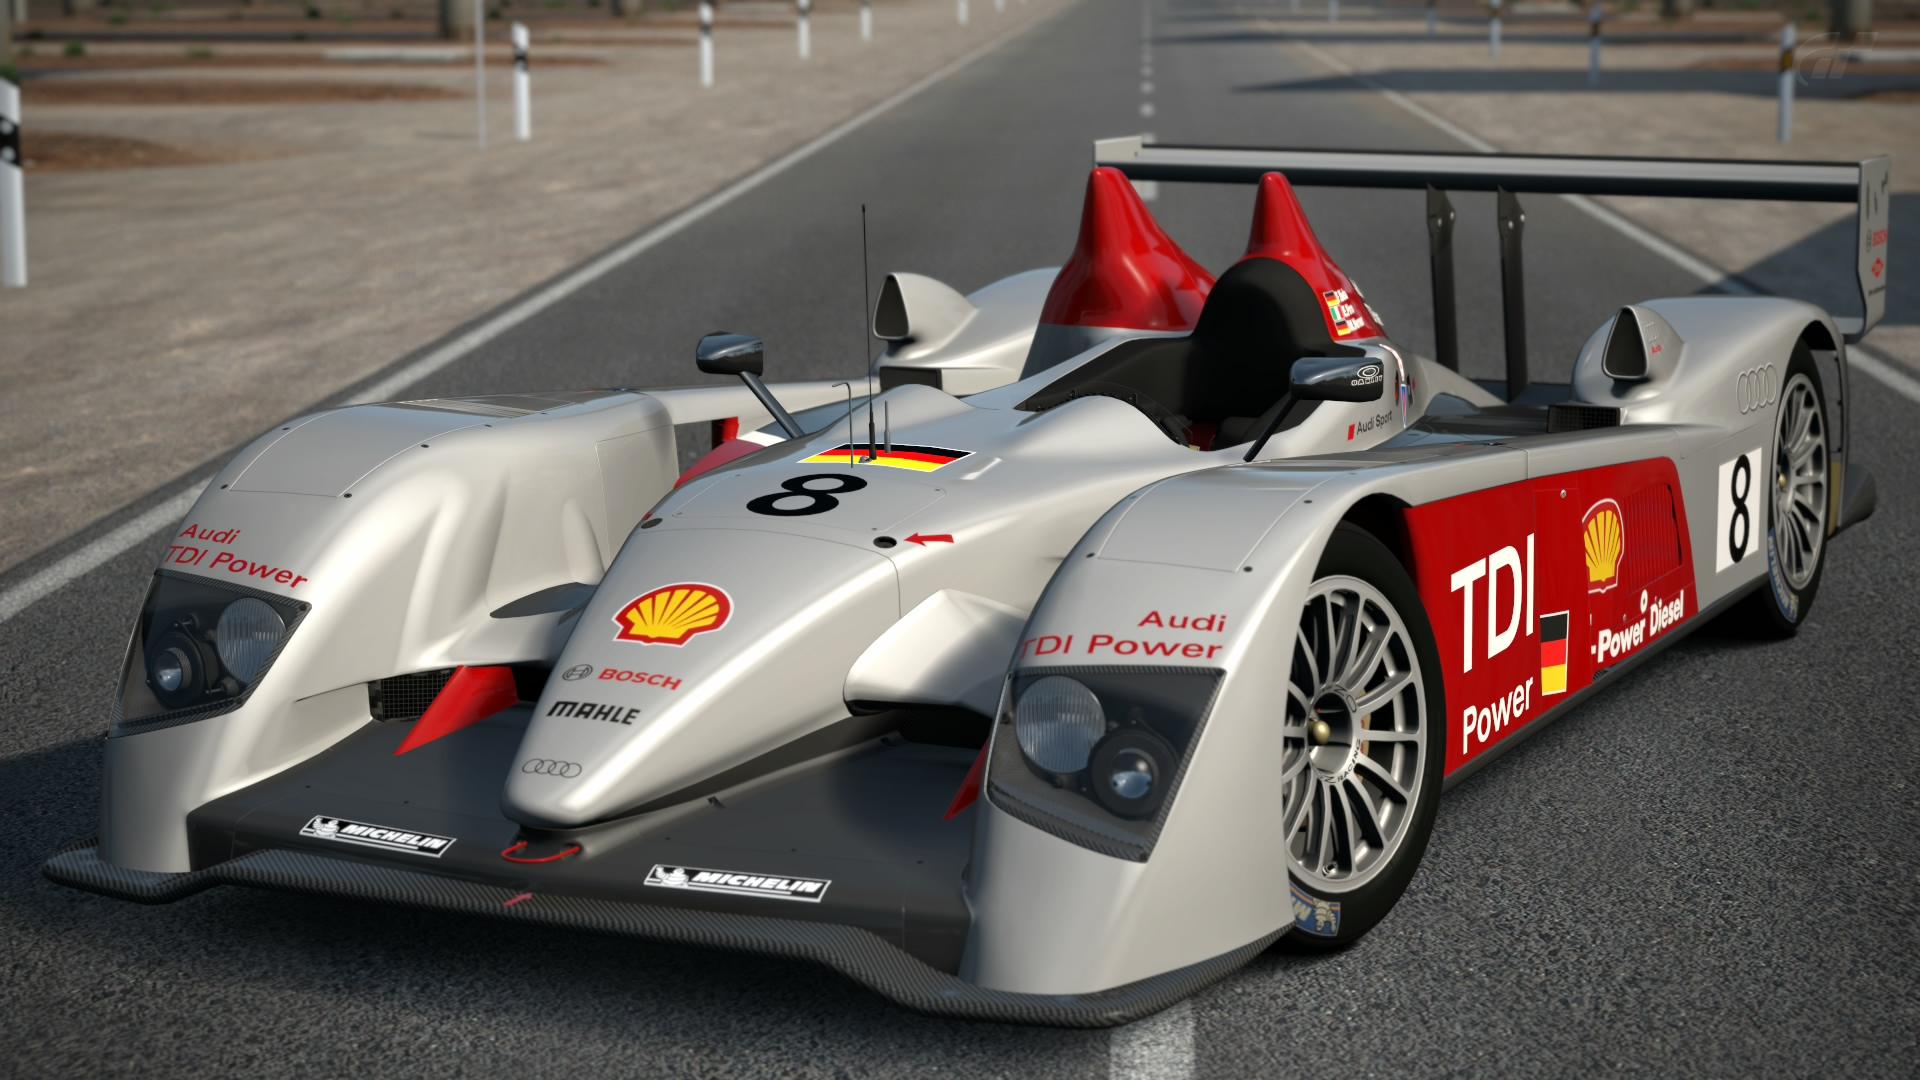 Audi R TDI Race Car Gran Turismo Wiki FANDOM Powered By Wikia - Audi r10